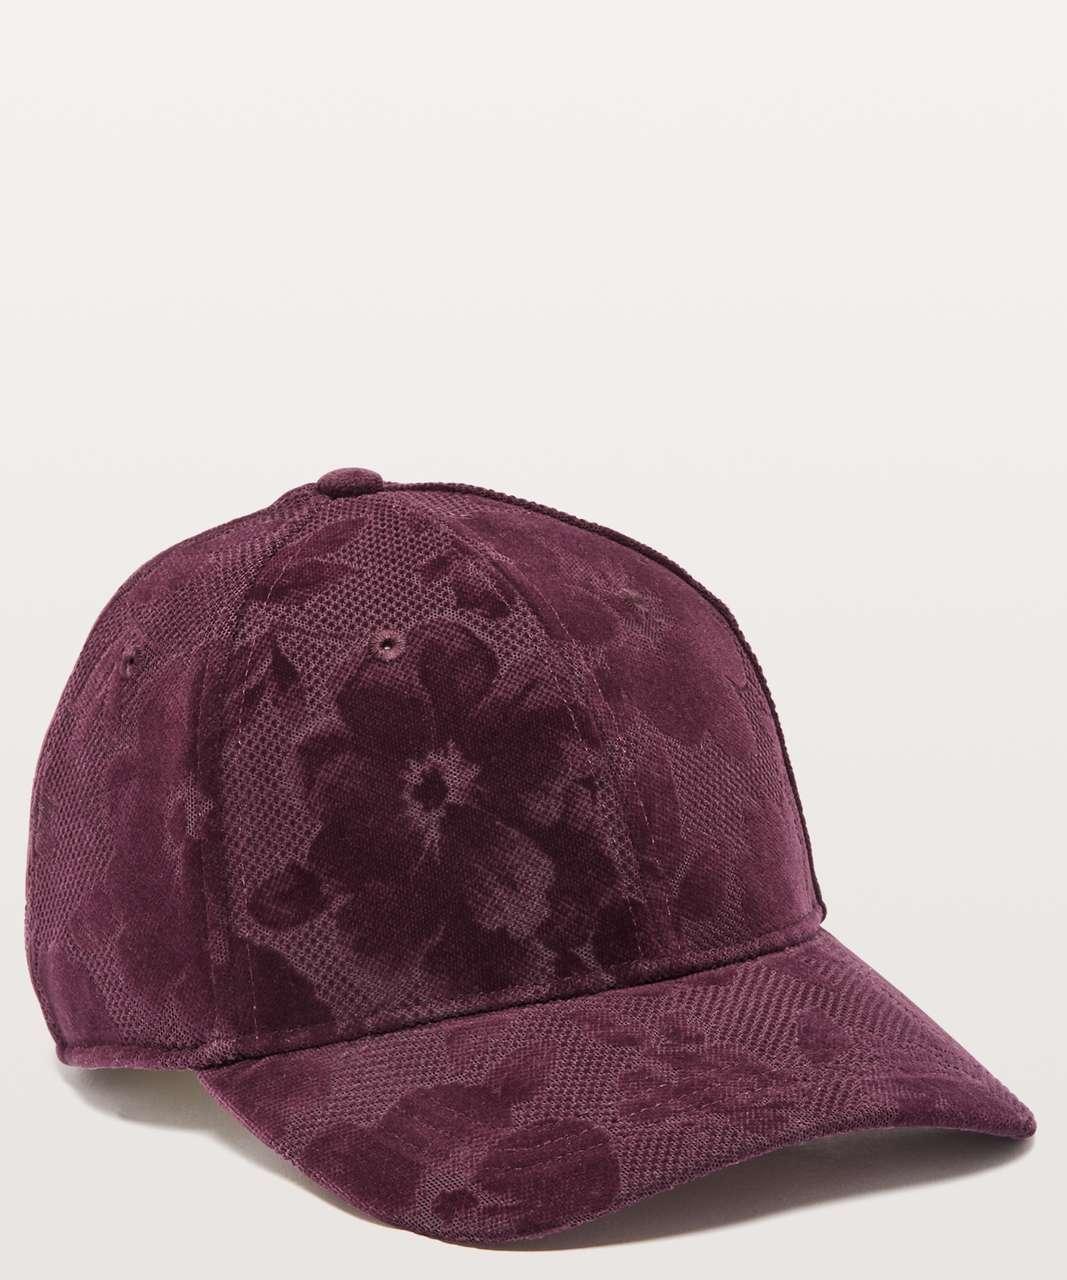 Lululemon Baller Hat *Flocked - Dark Adobe / Black Reflective